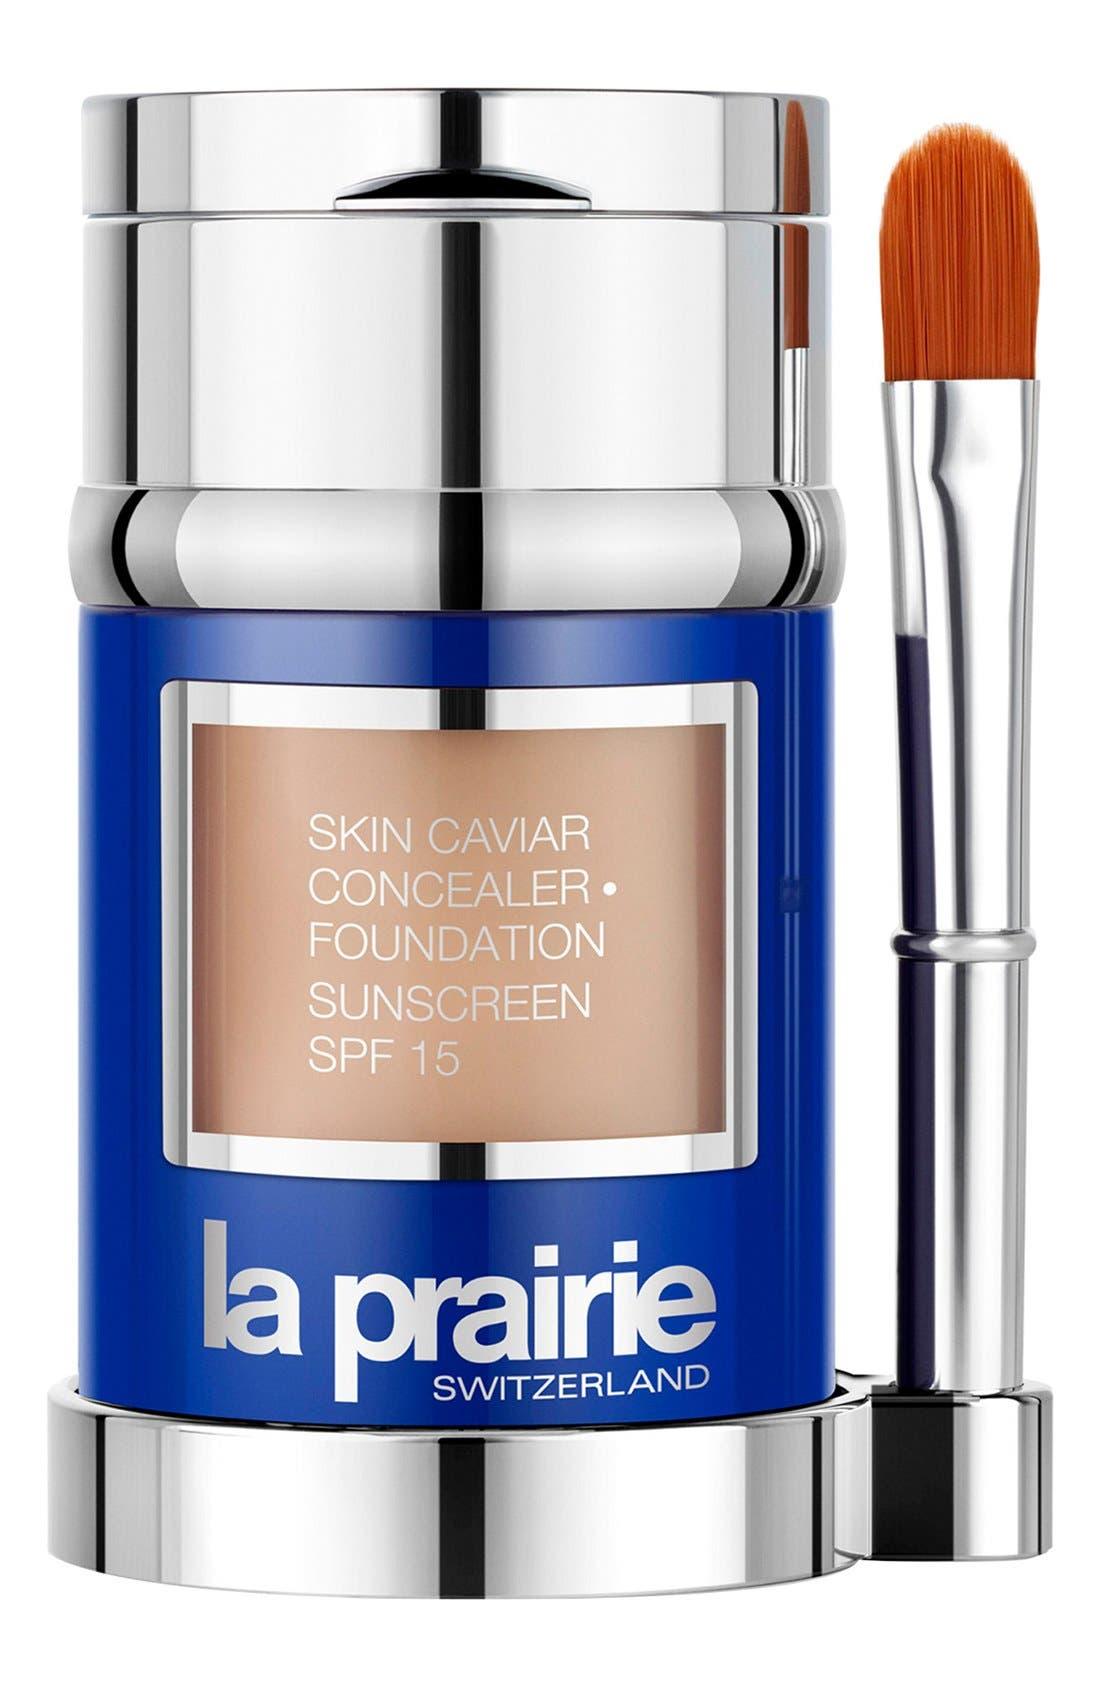 Skin Caviar Concealer + Foundation Sunscreen SPF 15,                             Main thumbnail 1, color,                             WARM BEIGE